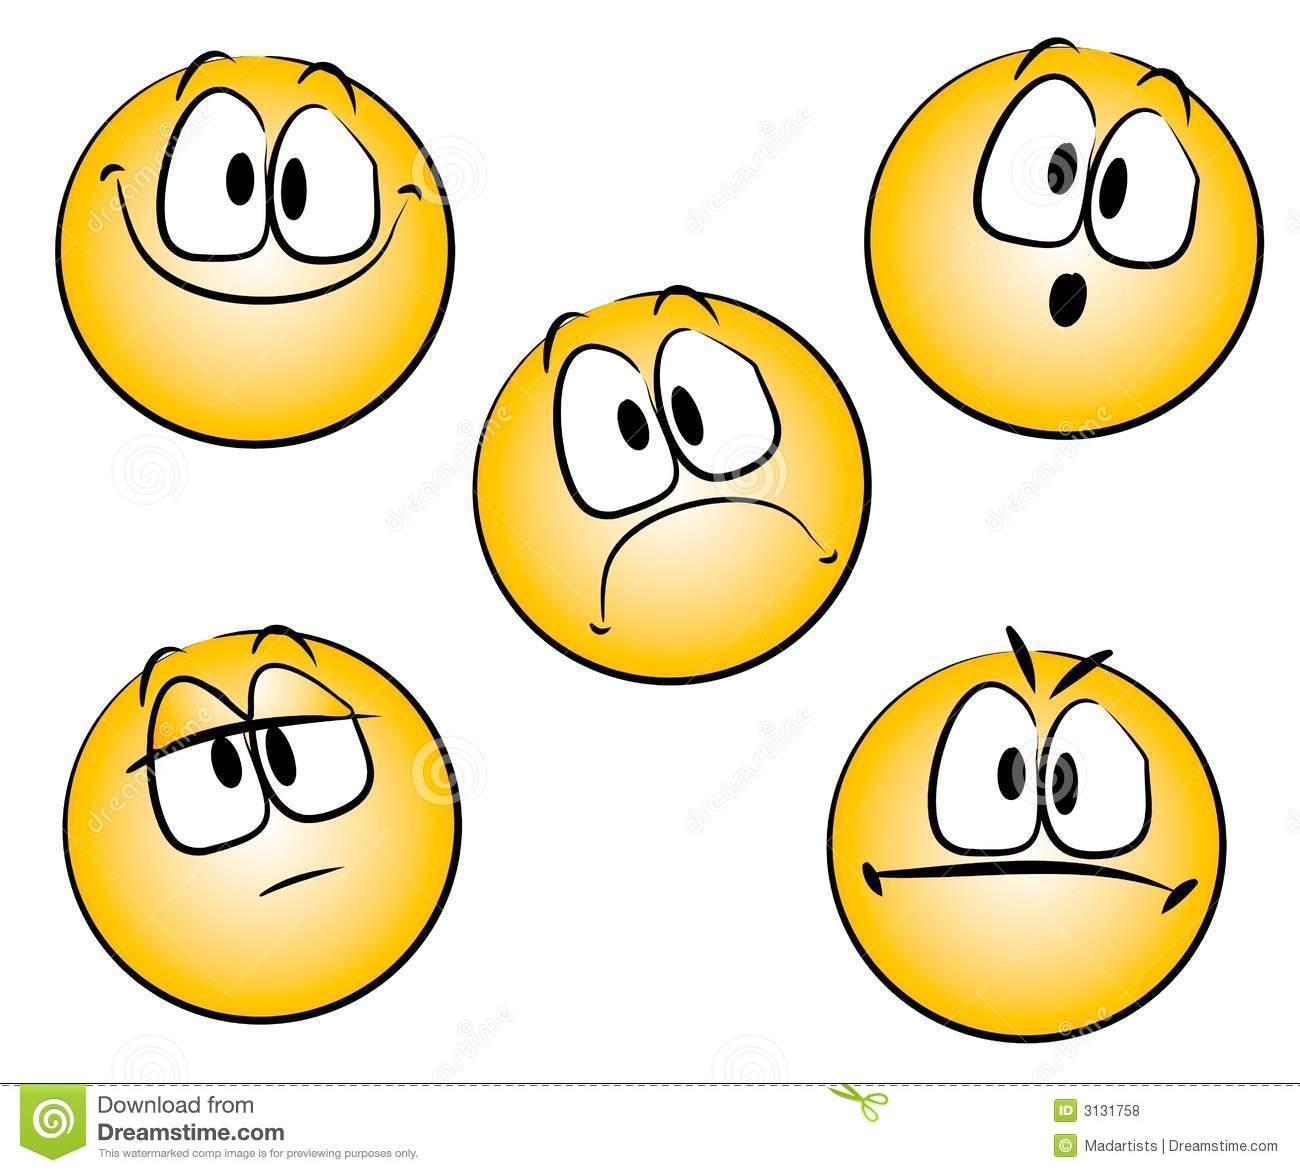 Emoticons Smileys Clip Art Royalty Free -Emoticons Smileys Clip Art Royalty Free Stock Photos Image 3131758-2